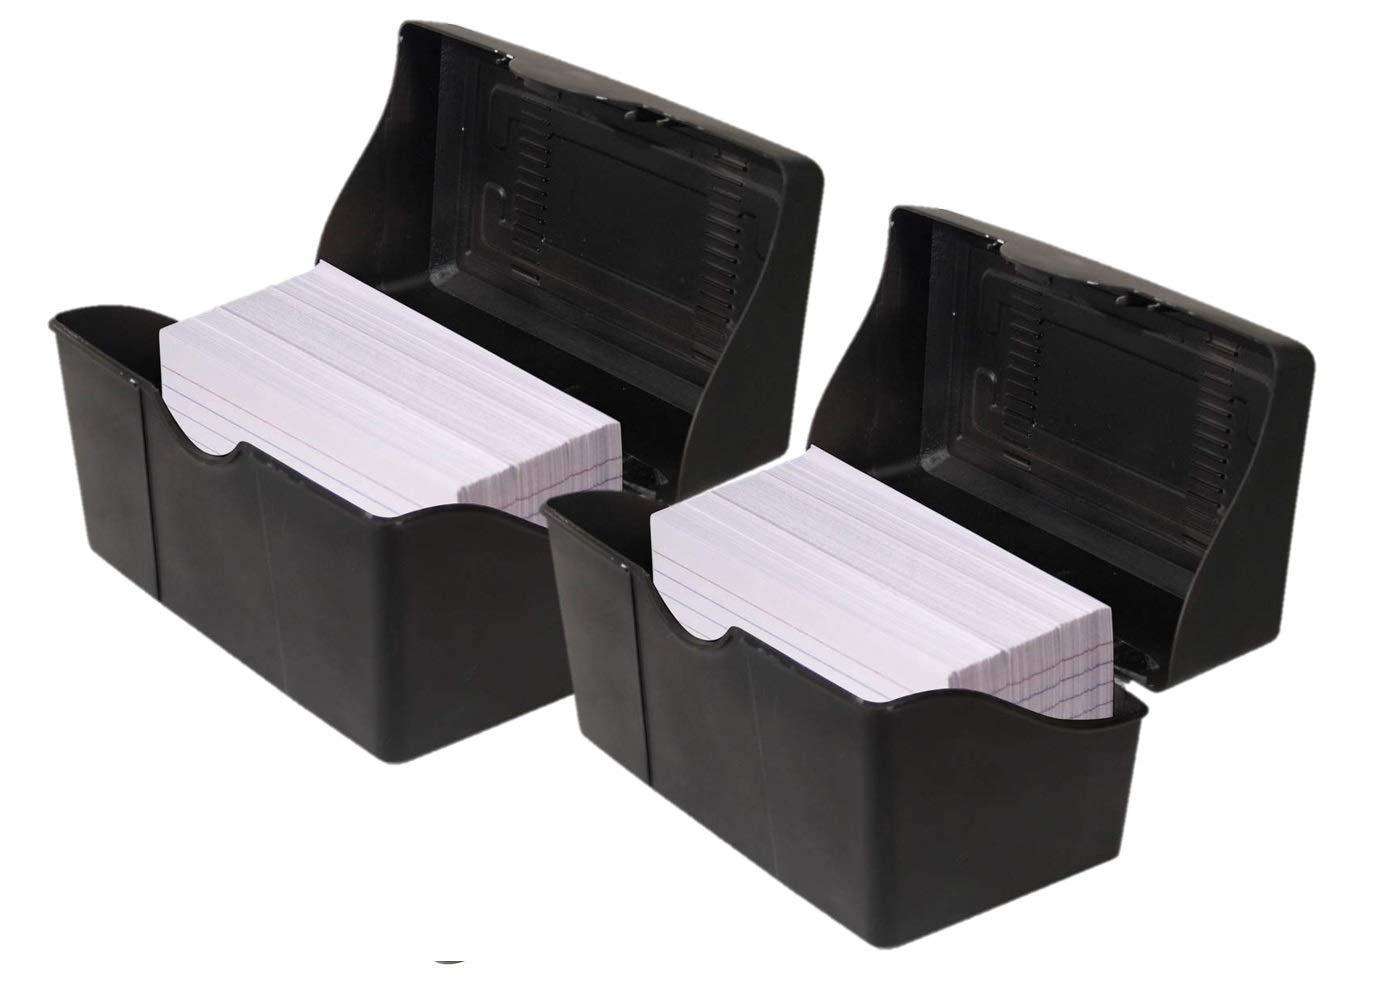 Amazon.com: 1InTheOffice - Caja para tarjetas de índice ...